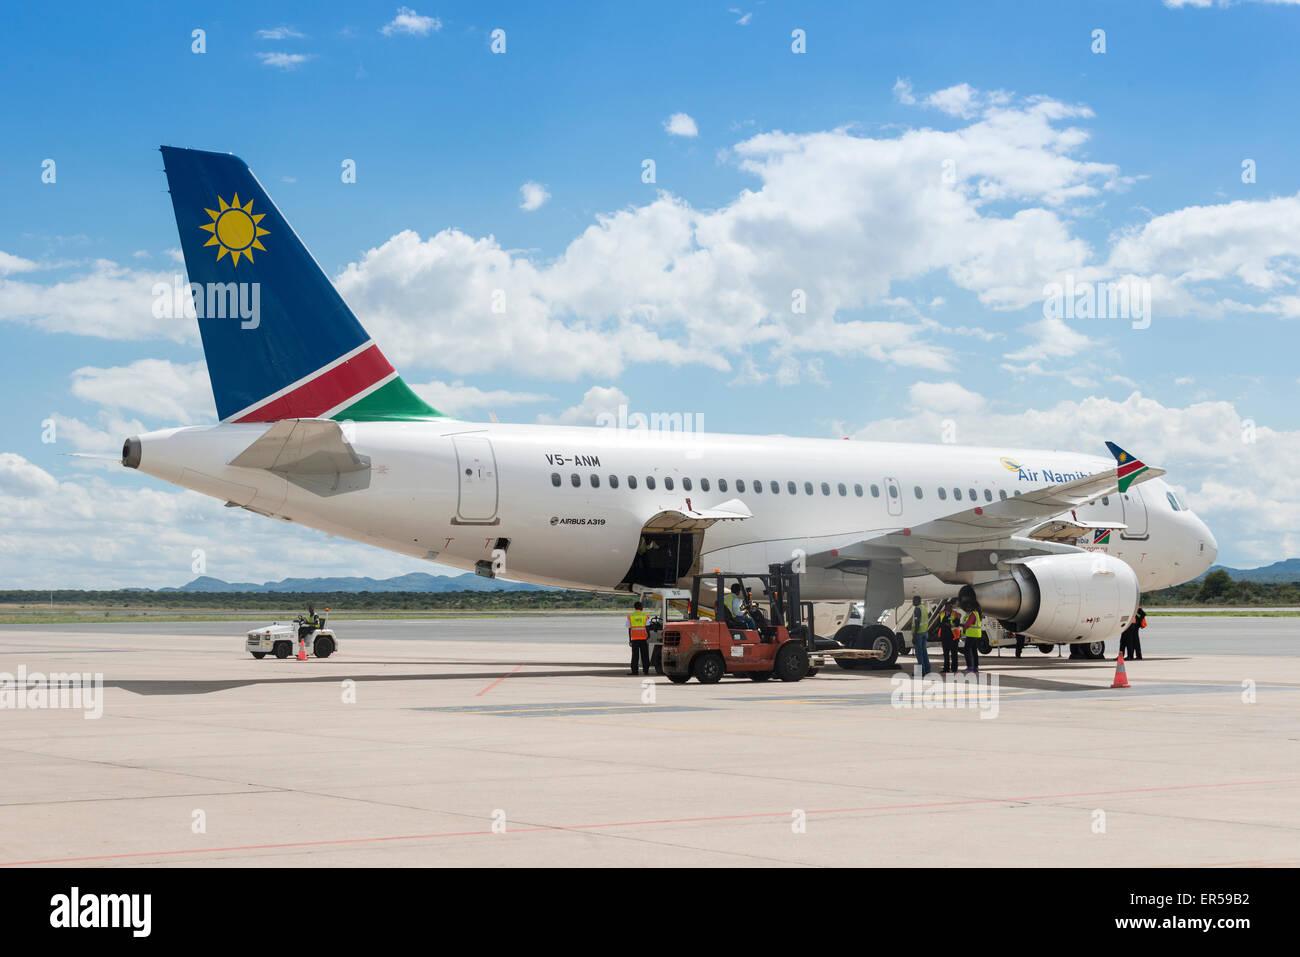 Air Namibia Airbus A319 on tarmac at Hosea Kutako International Airport, Windhoek (Windhuk), Khomas Region, Republic - Stock Image